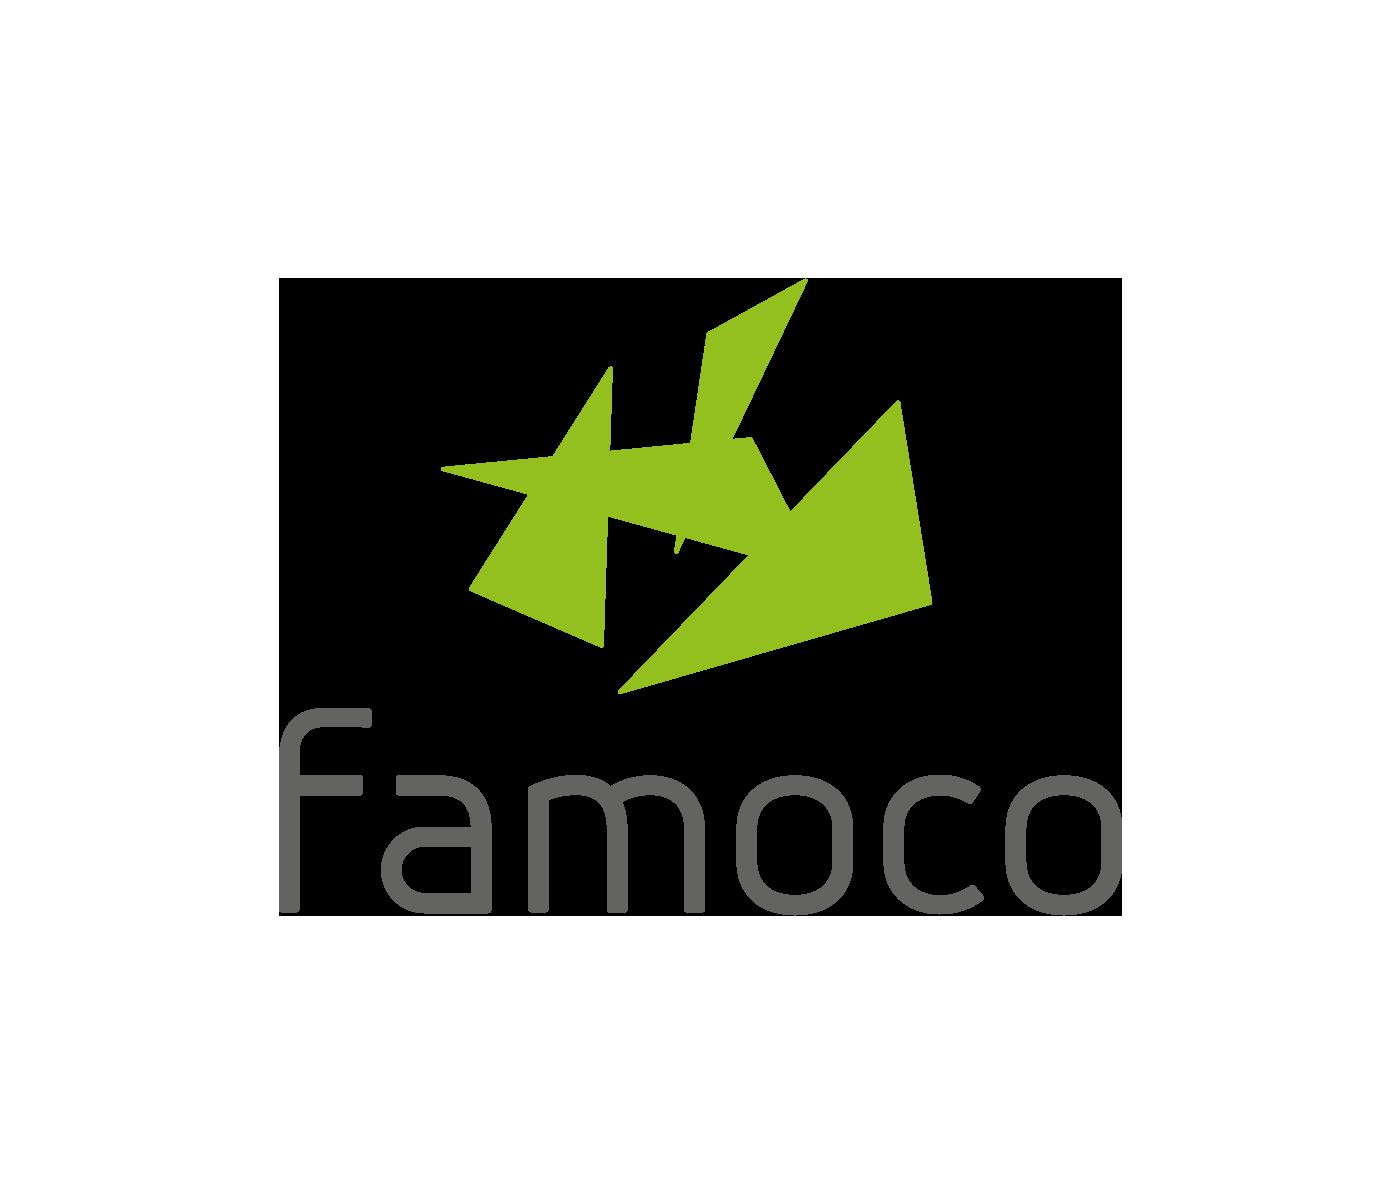 famoco_logo_rbg